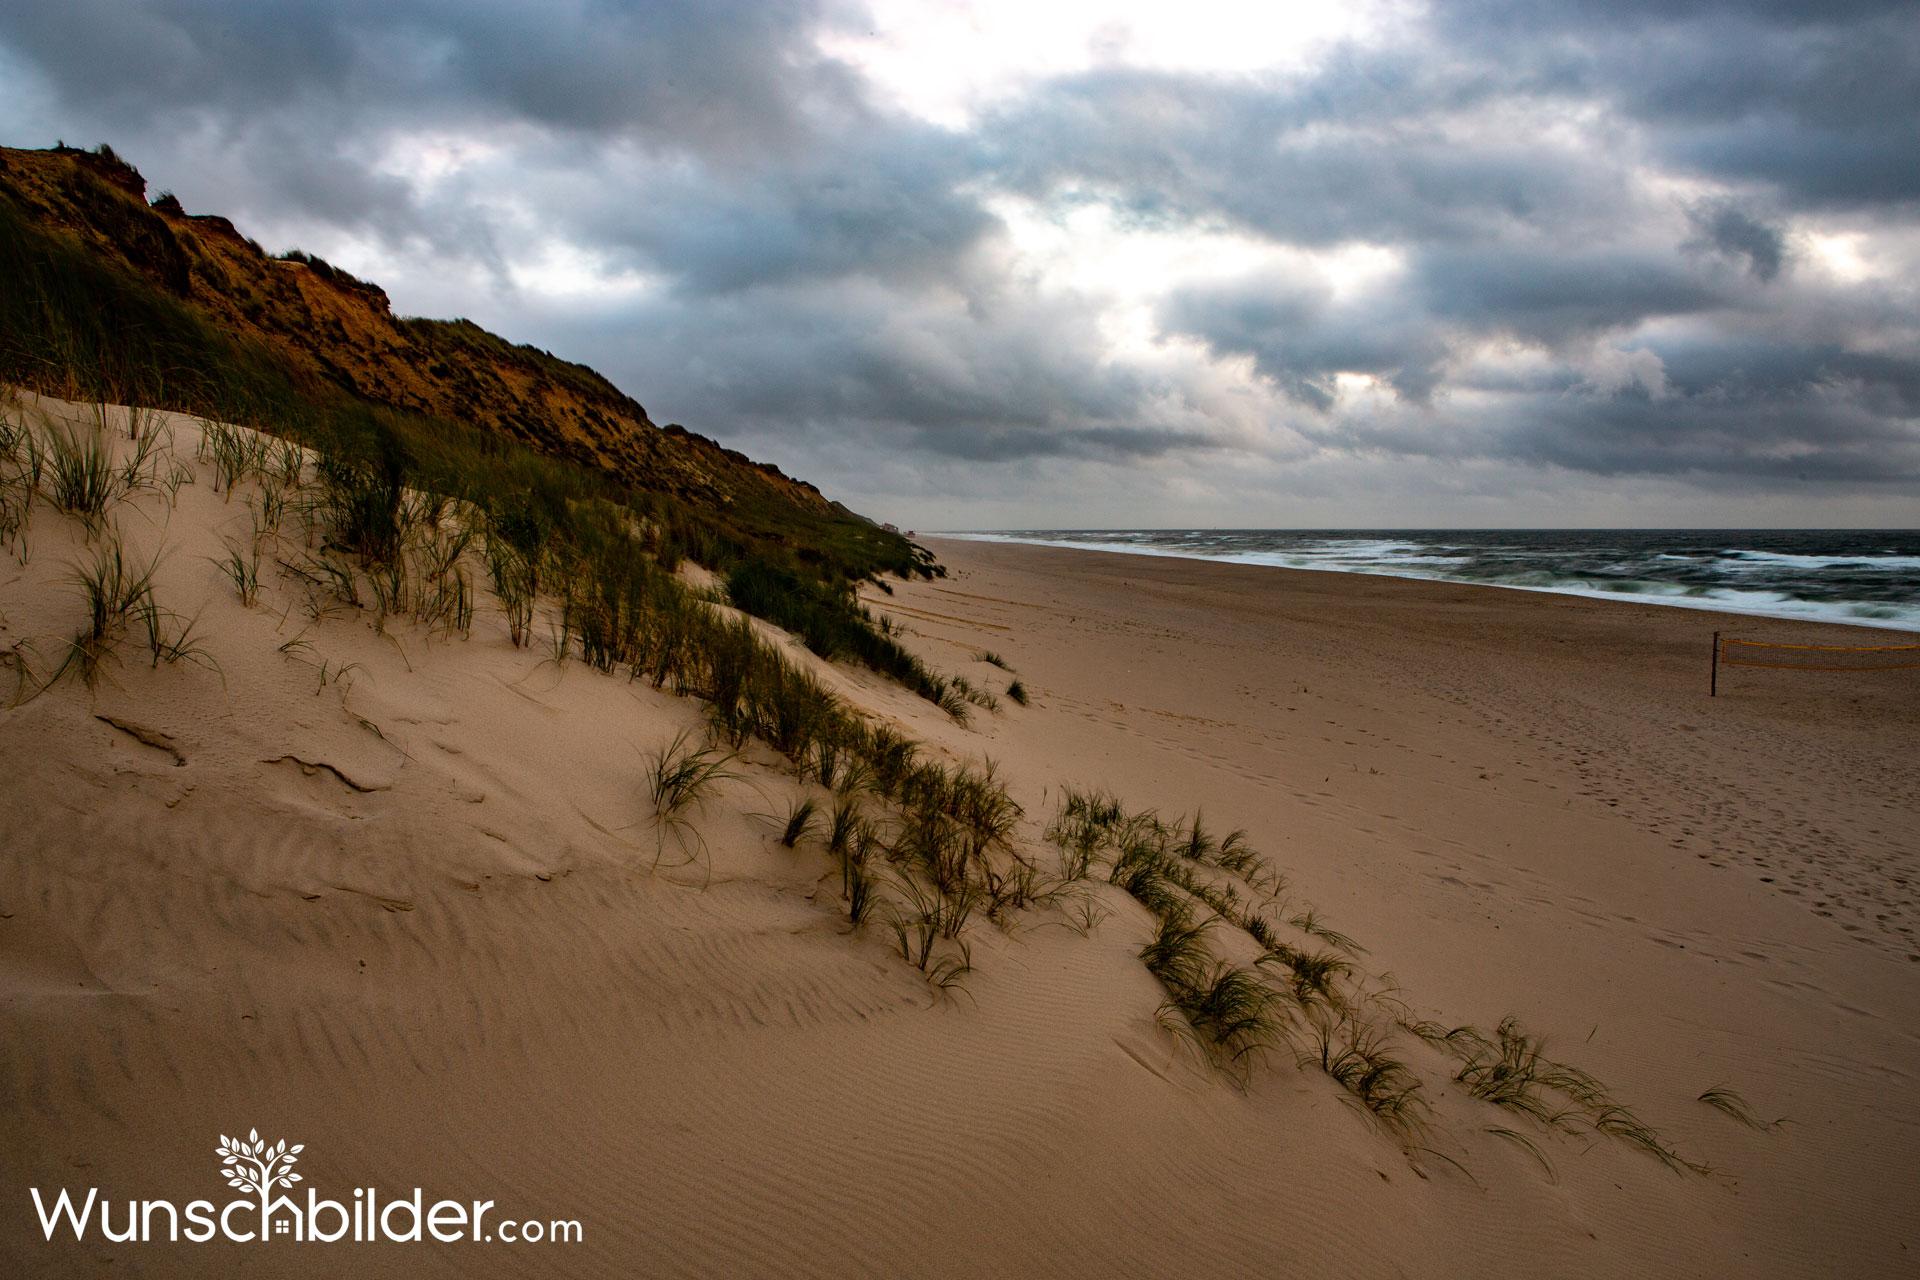 Rotes Kliff Sylt - Sylter-Weststrand - wunschbilder.com - Fotograf Sascha Block